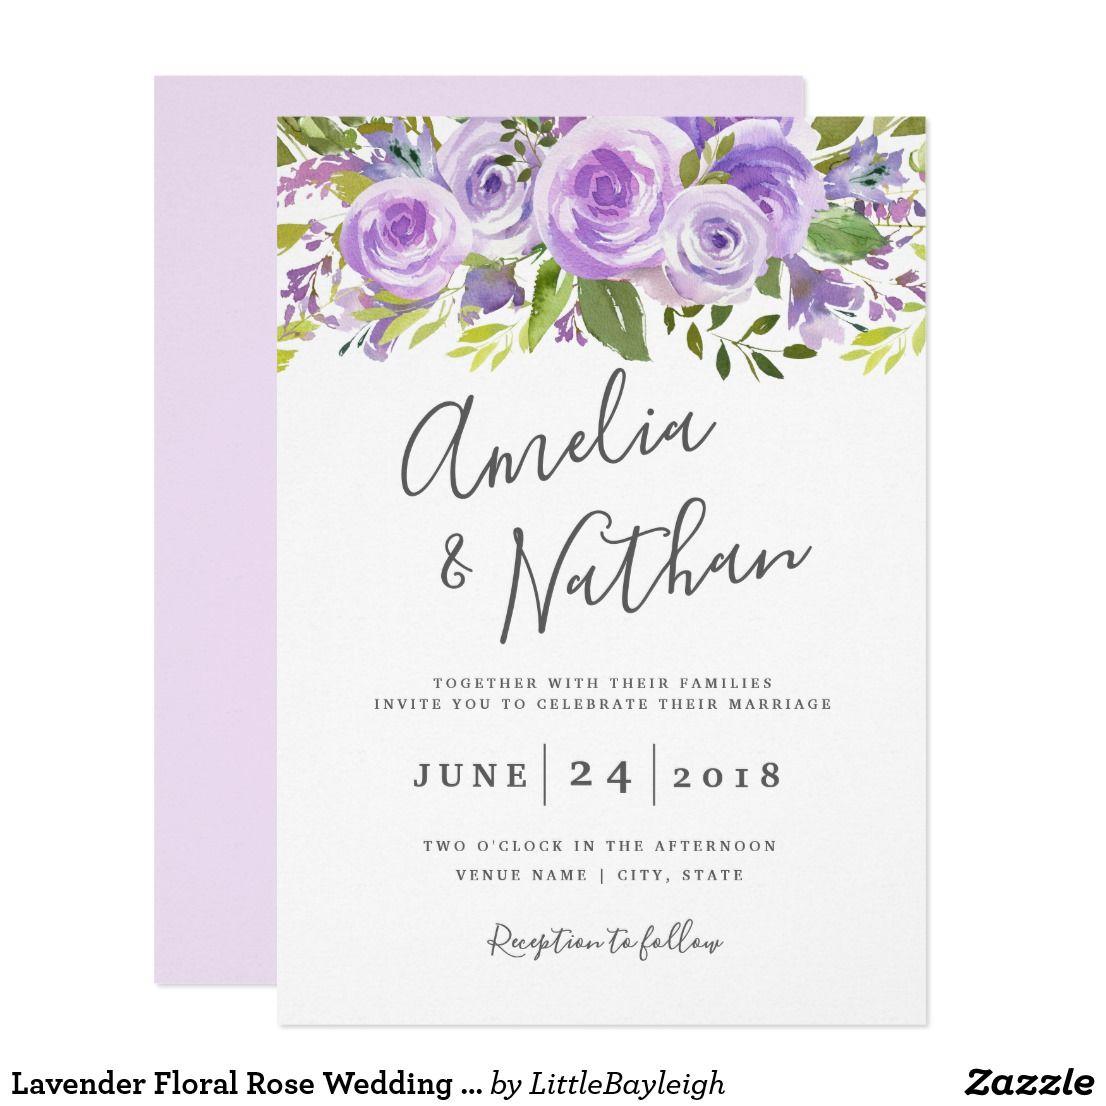 Lavender Floral Rose Wedding Invitation | Rose wedding, Wedding and ...